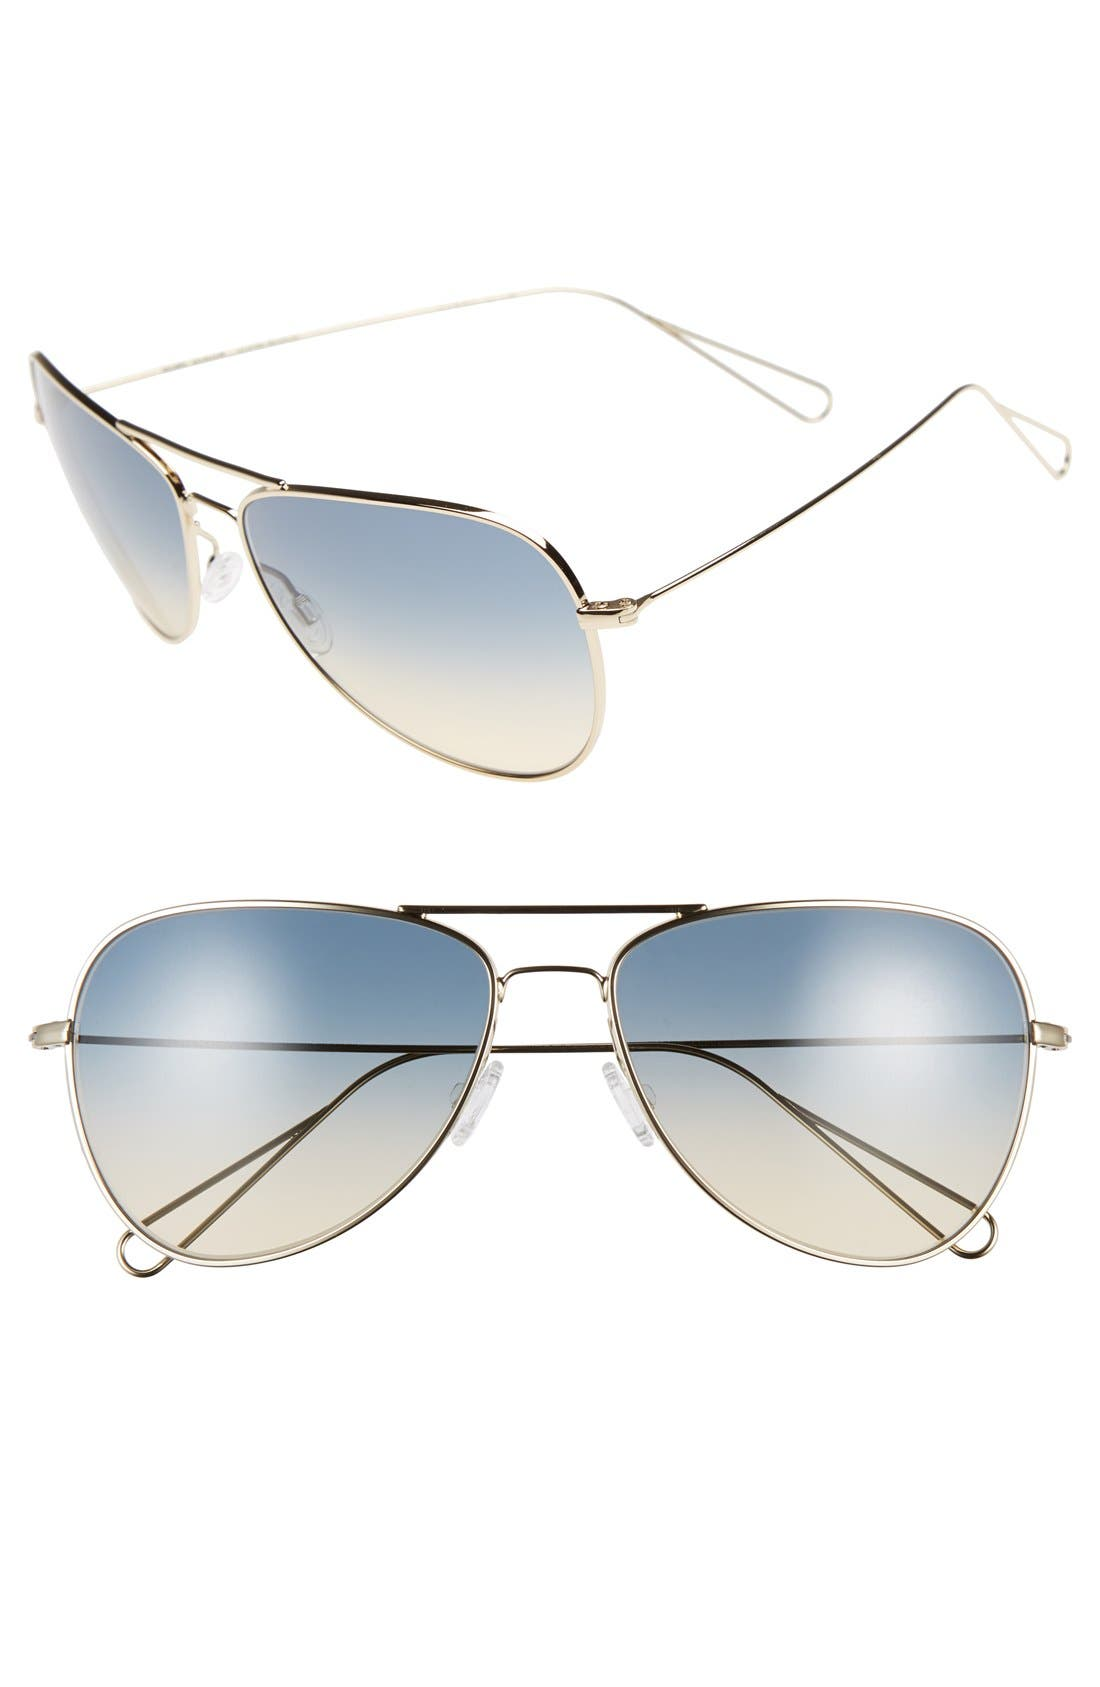 Alternate Image 1 Selected - Oliver Peoples x Isabel Marant 'Matt' 60mm Aviator Sunglasses